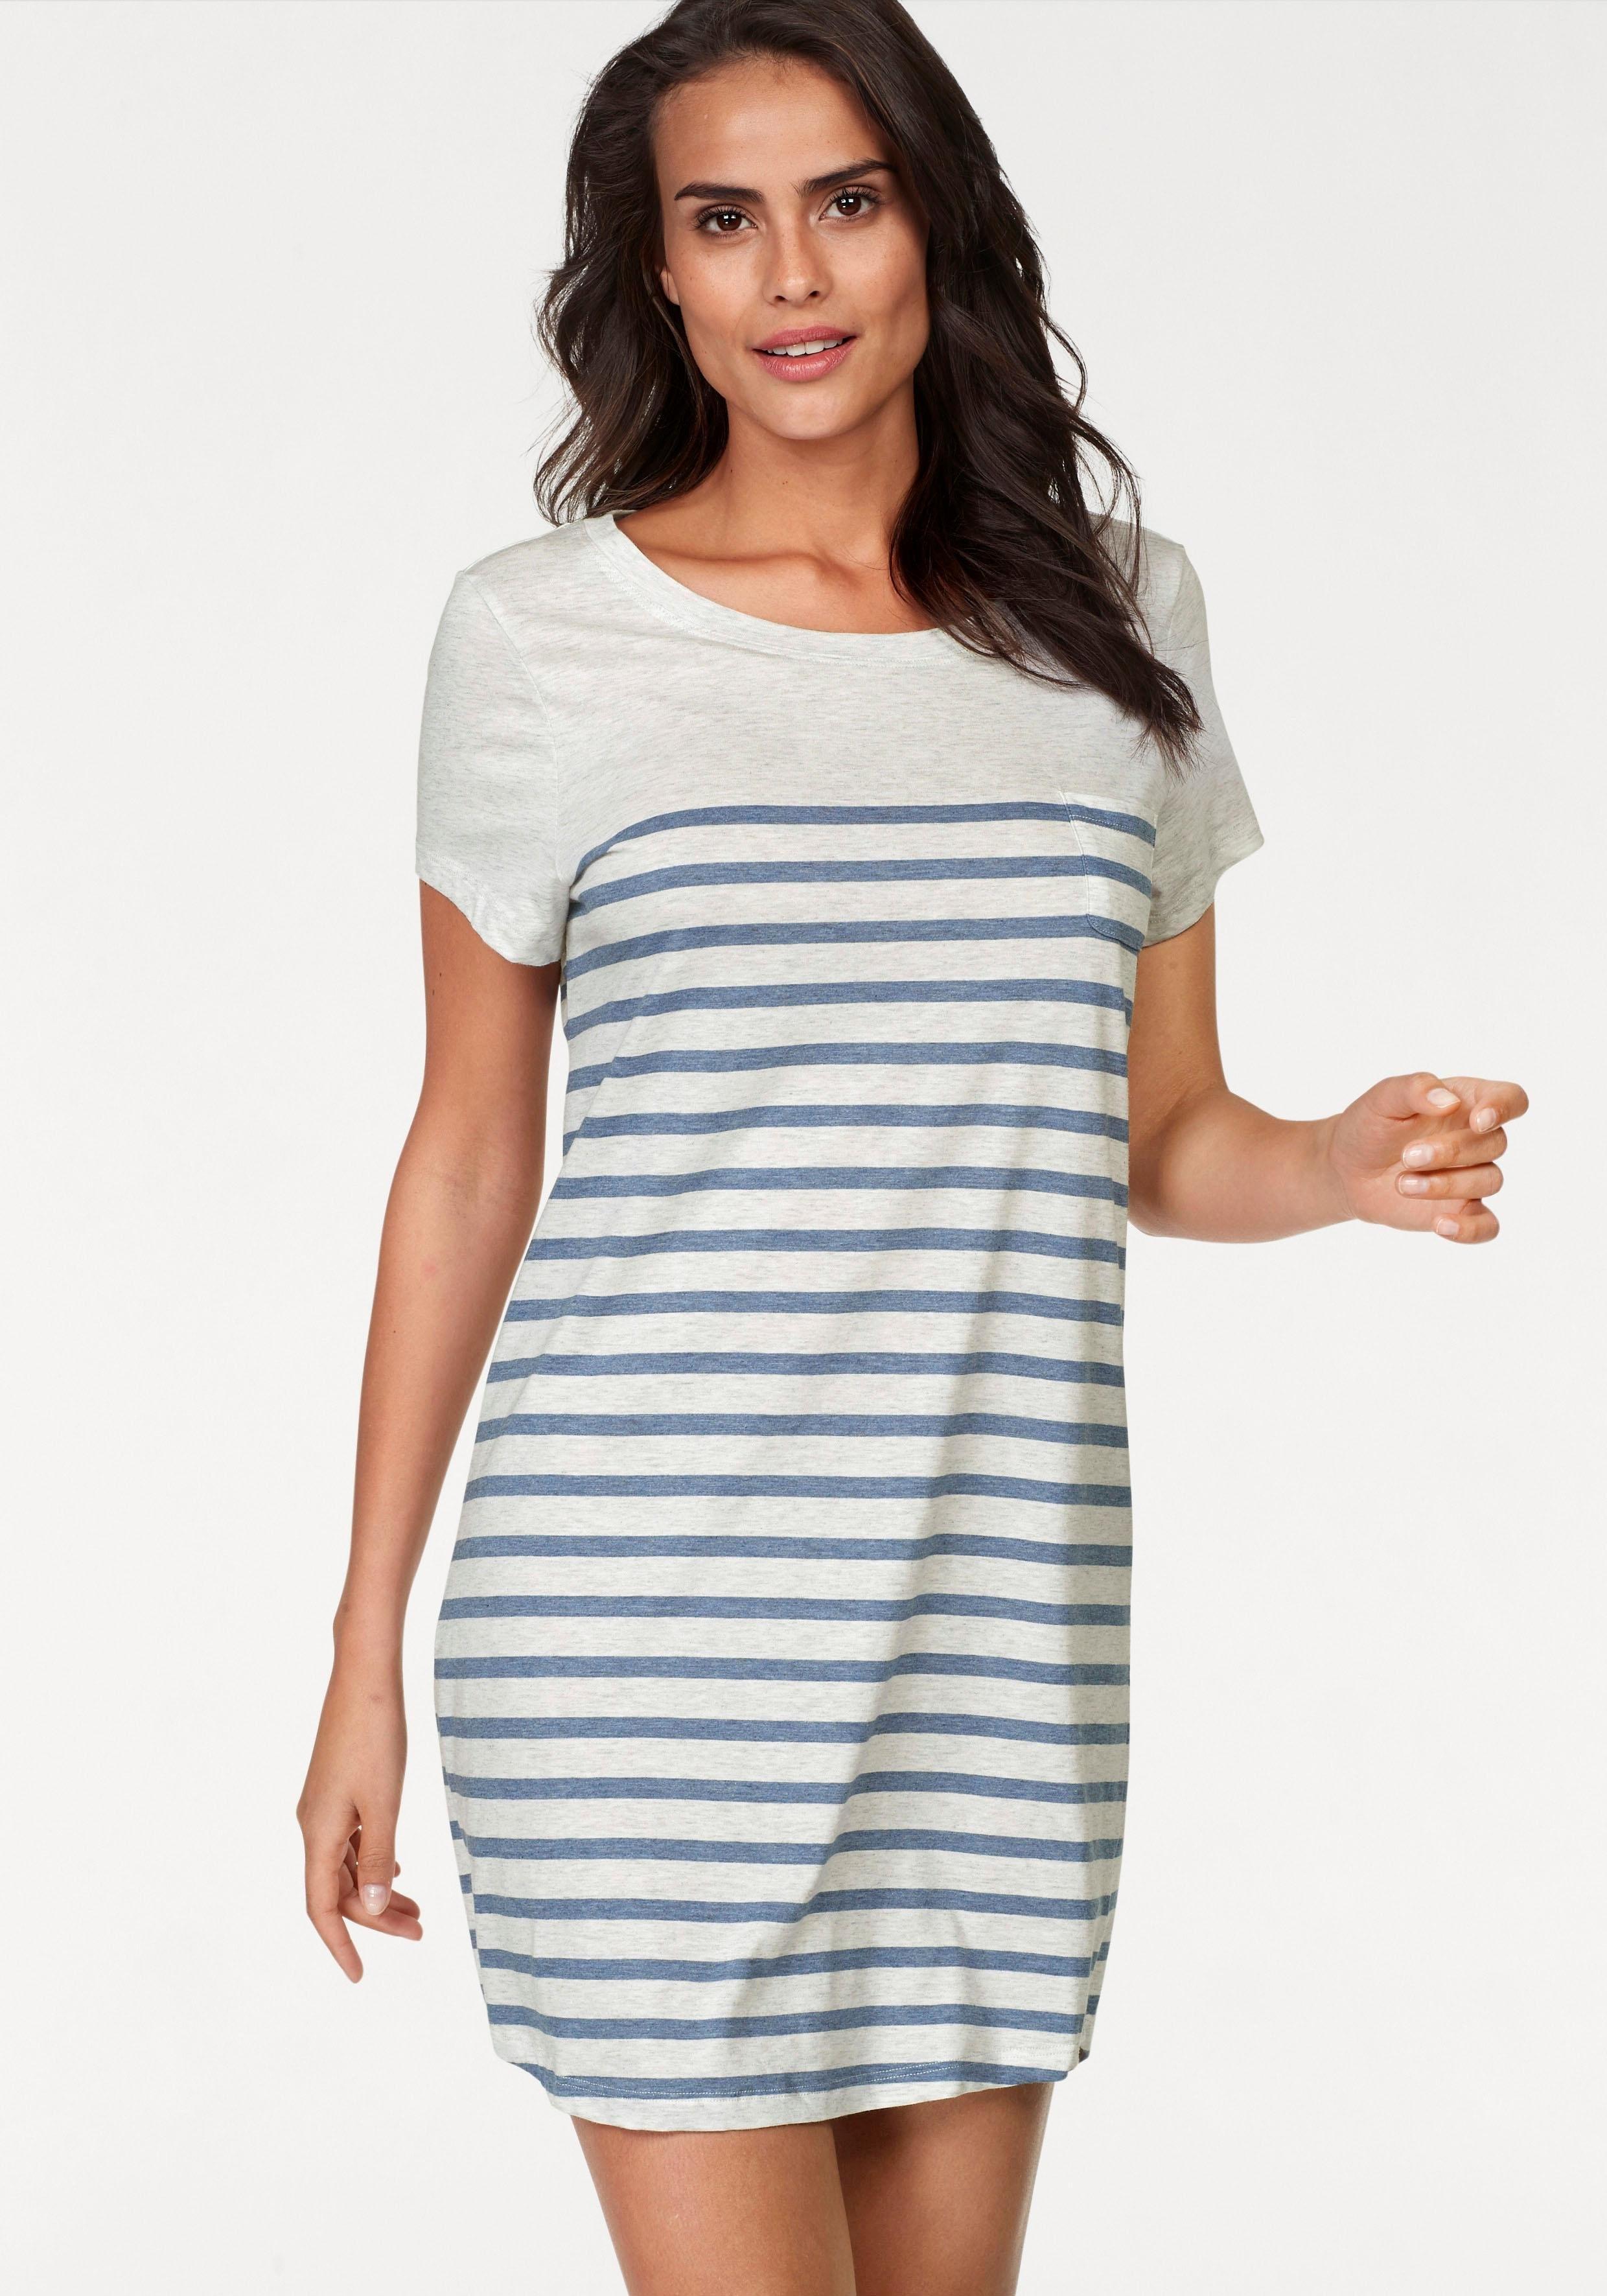 Marc O'Polo nachthemd met streepdessin bij Lascana online kopen